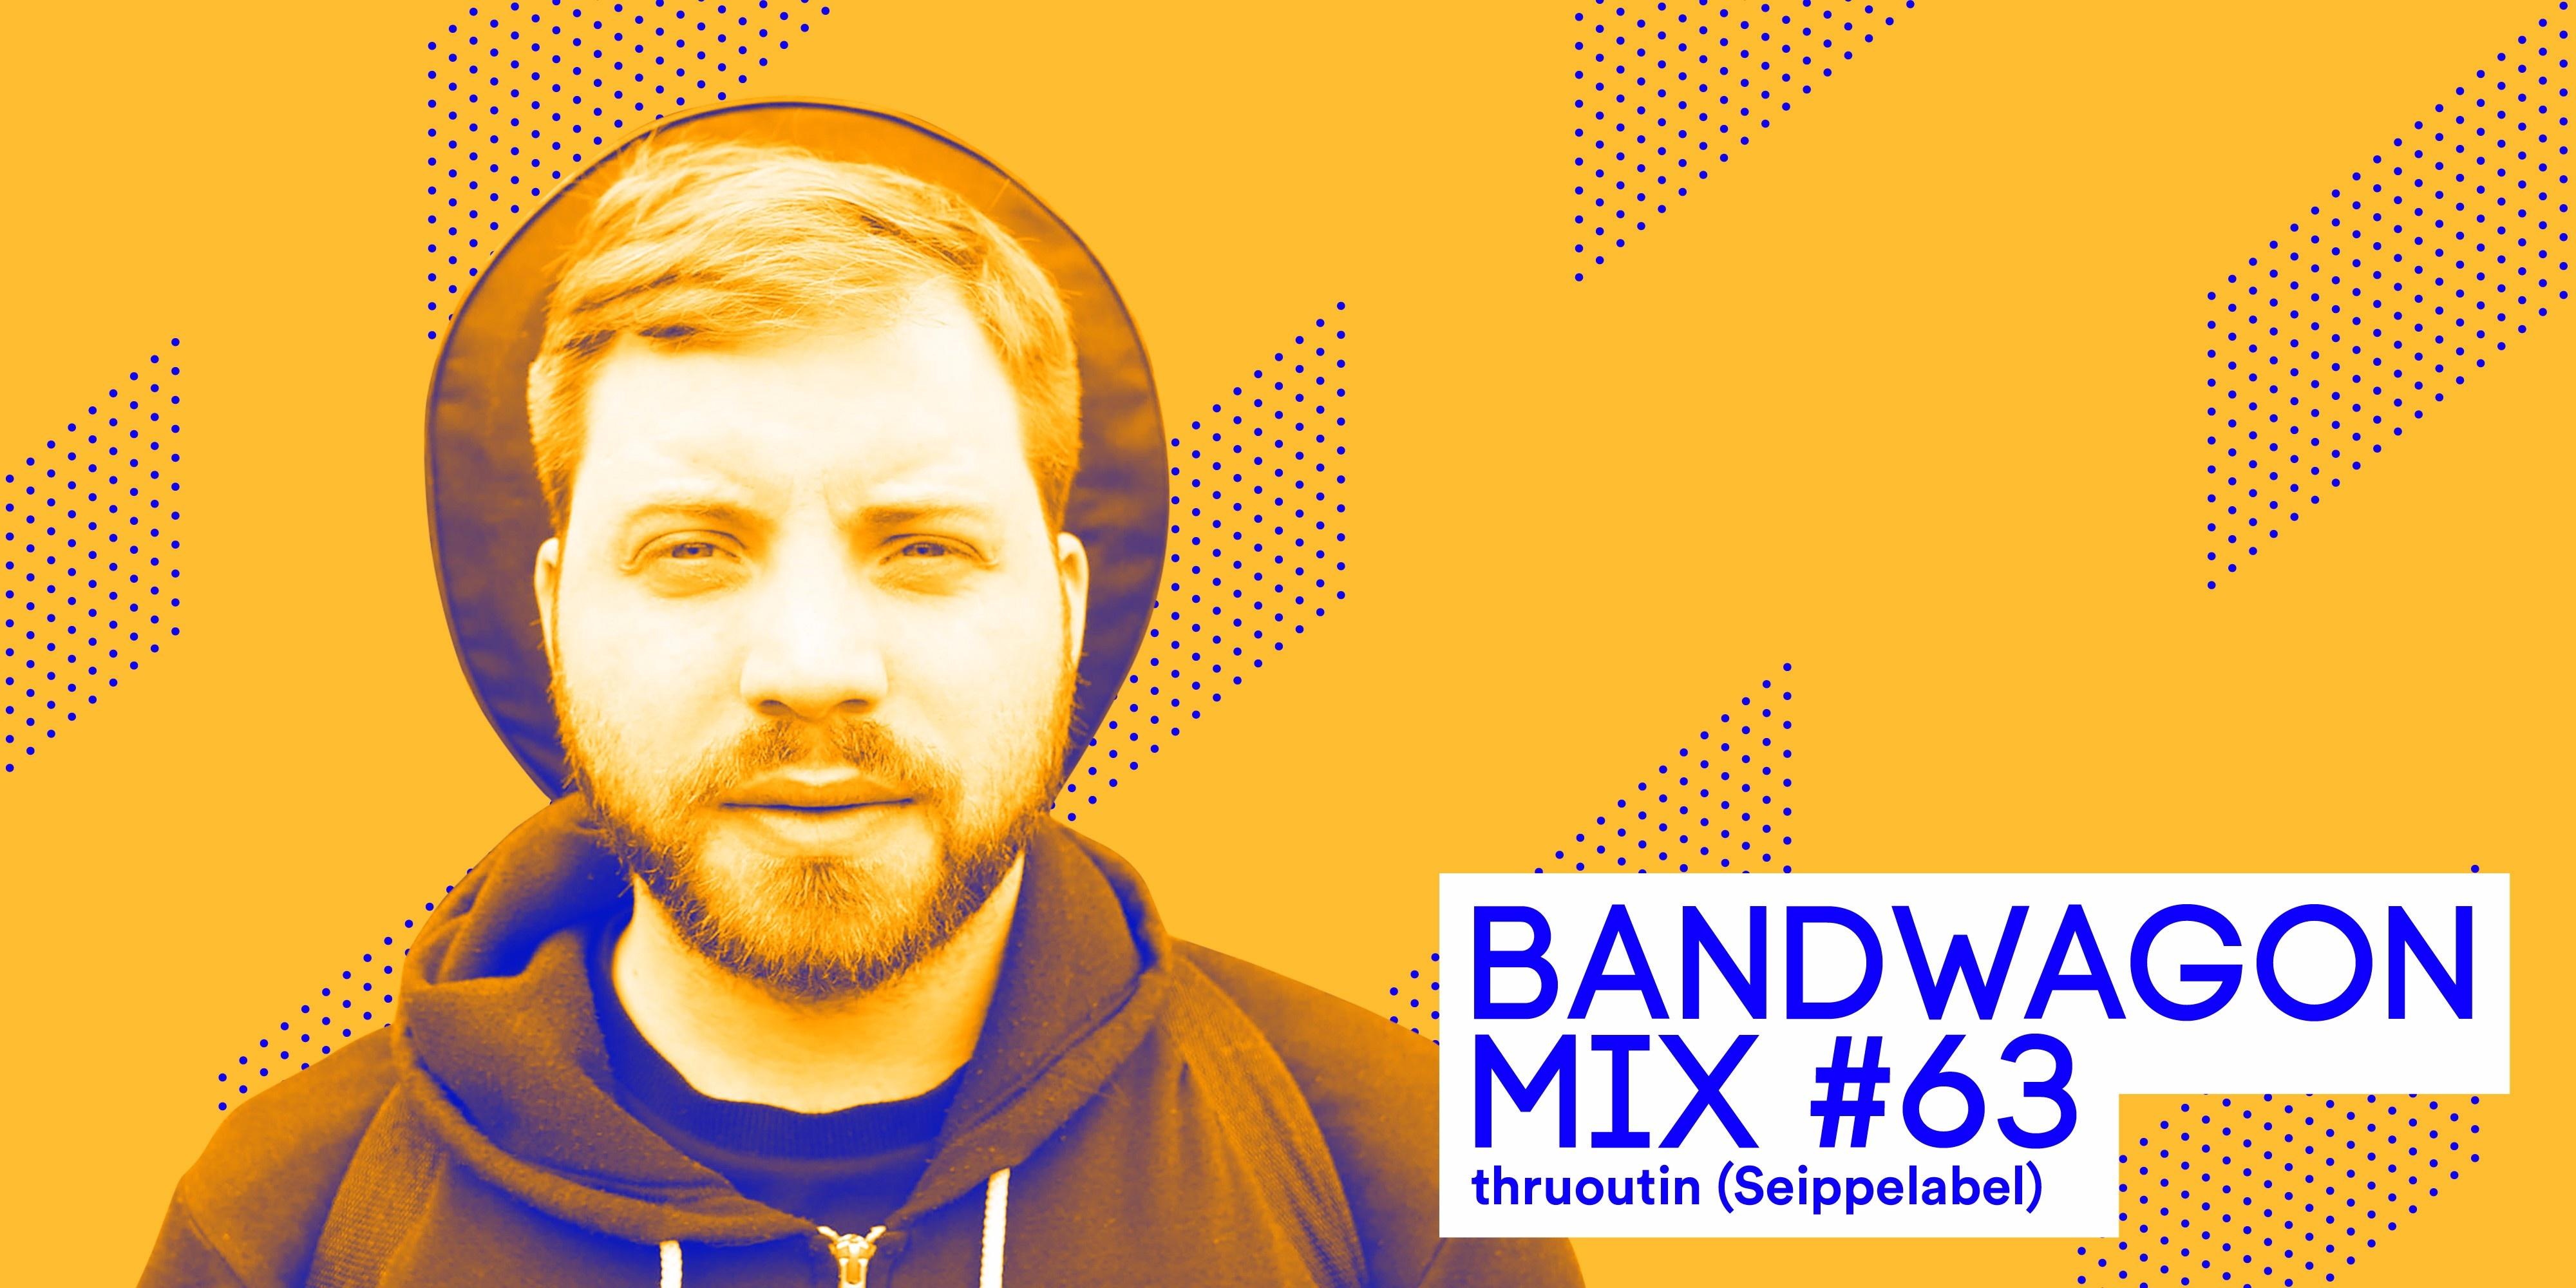 Bandwagon Mix #63: thruoutin (Seippelabel)